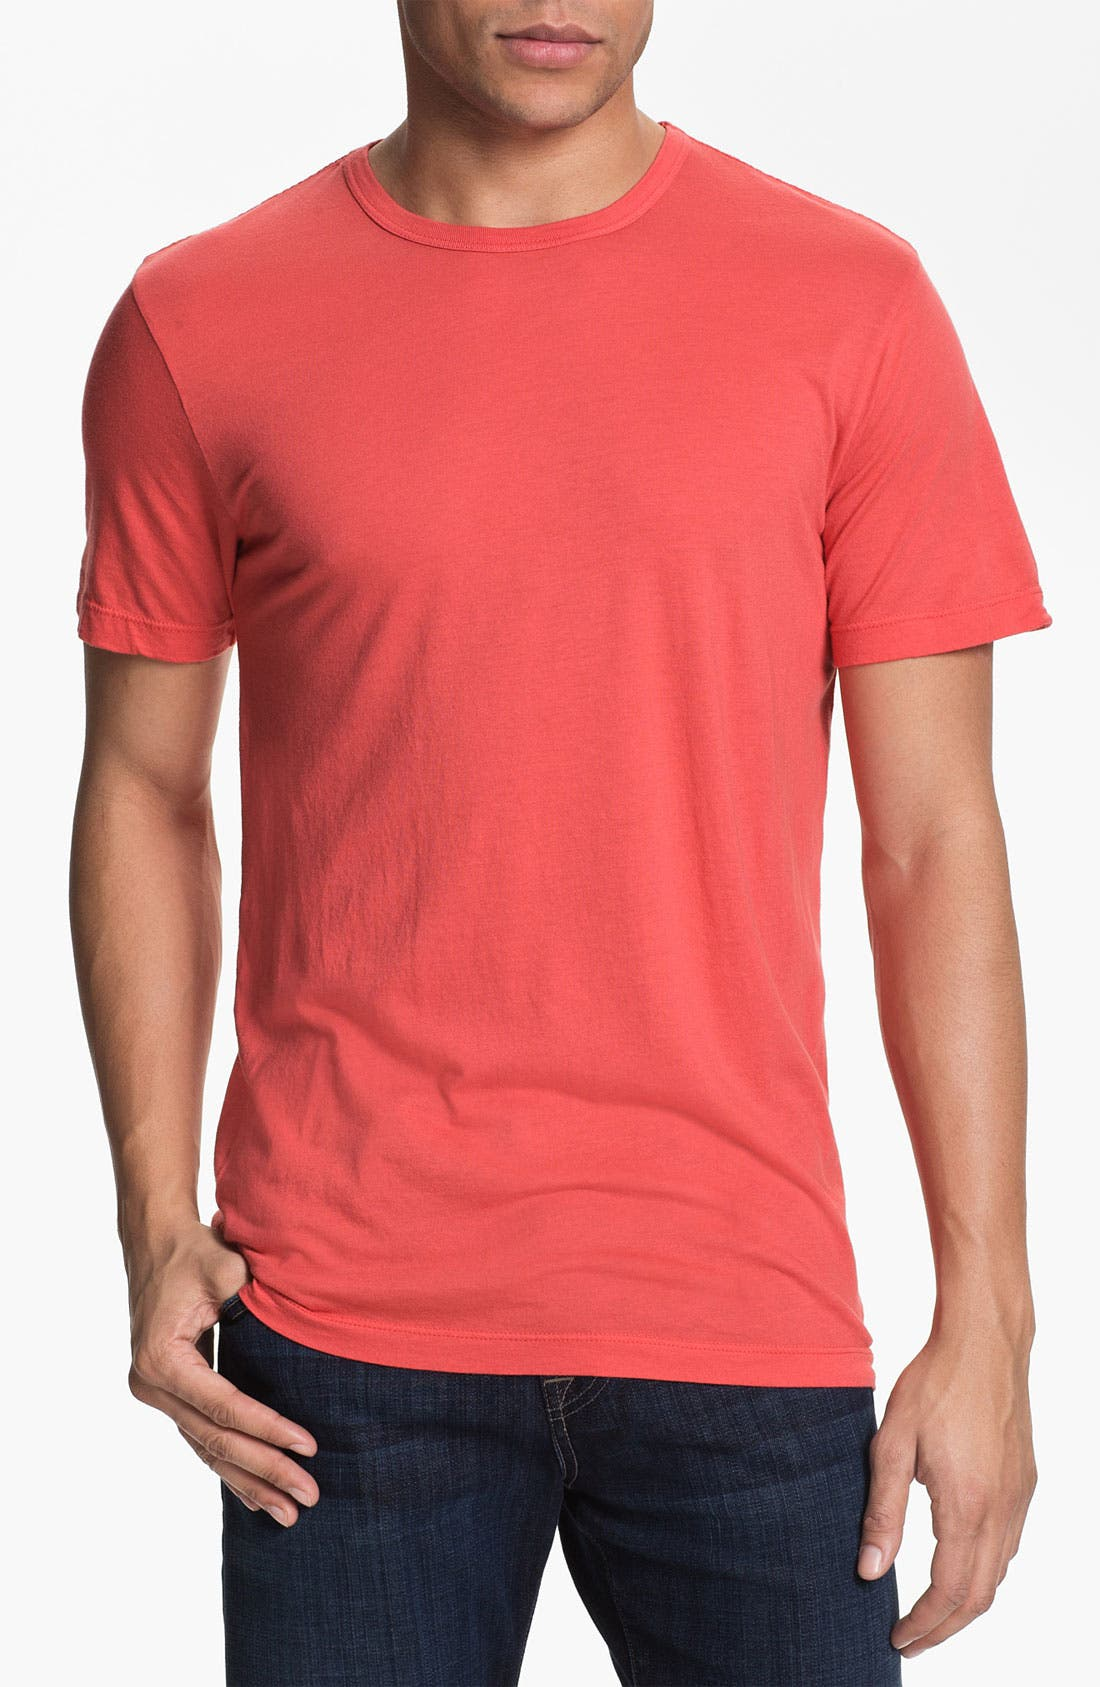 Alternate Image 1 Selected - Splendid Mills 'Always' Crewneck T-Shirt